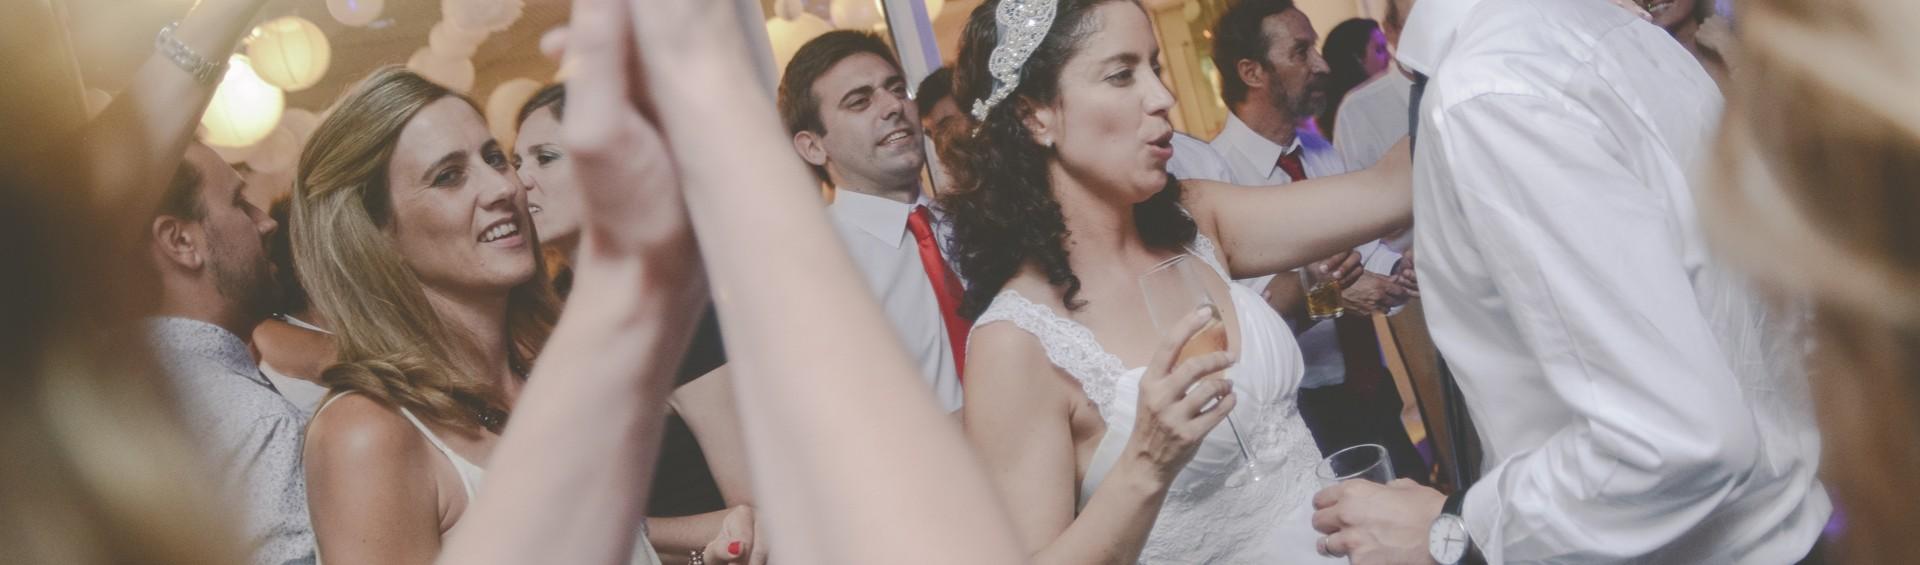 wedding photography, fotografia de bodas fiesta